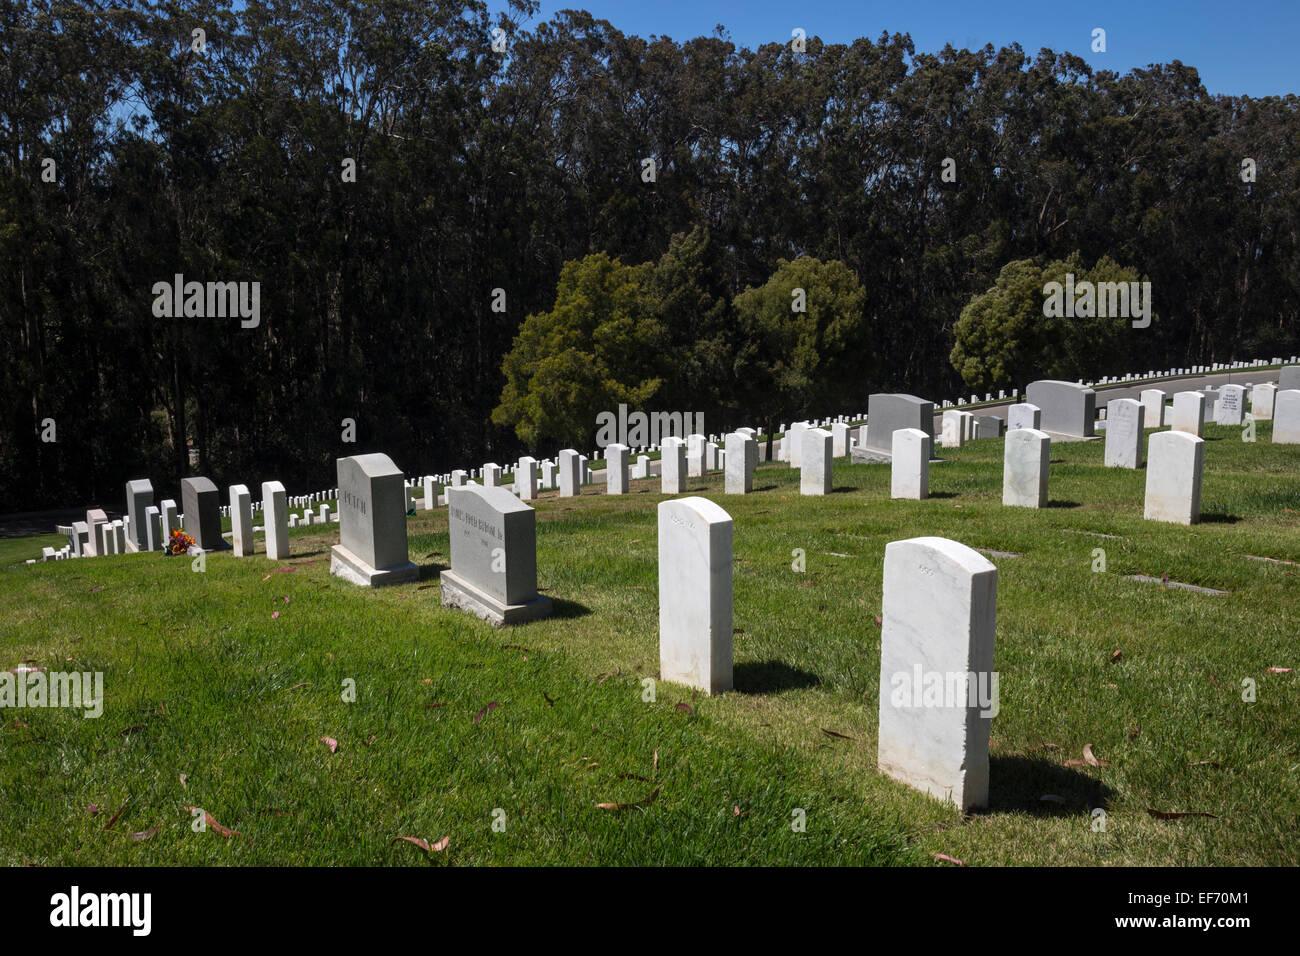 headstones, San Francisco National Cemetery, National Cemetery, Presidio, city of San Francisco, San Francisco, - Stock Image